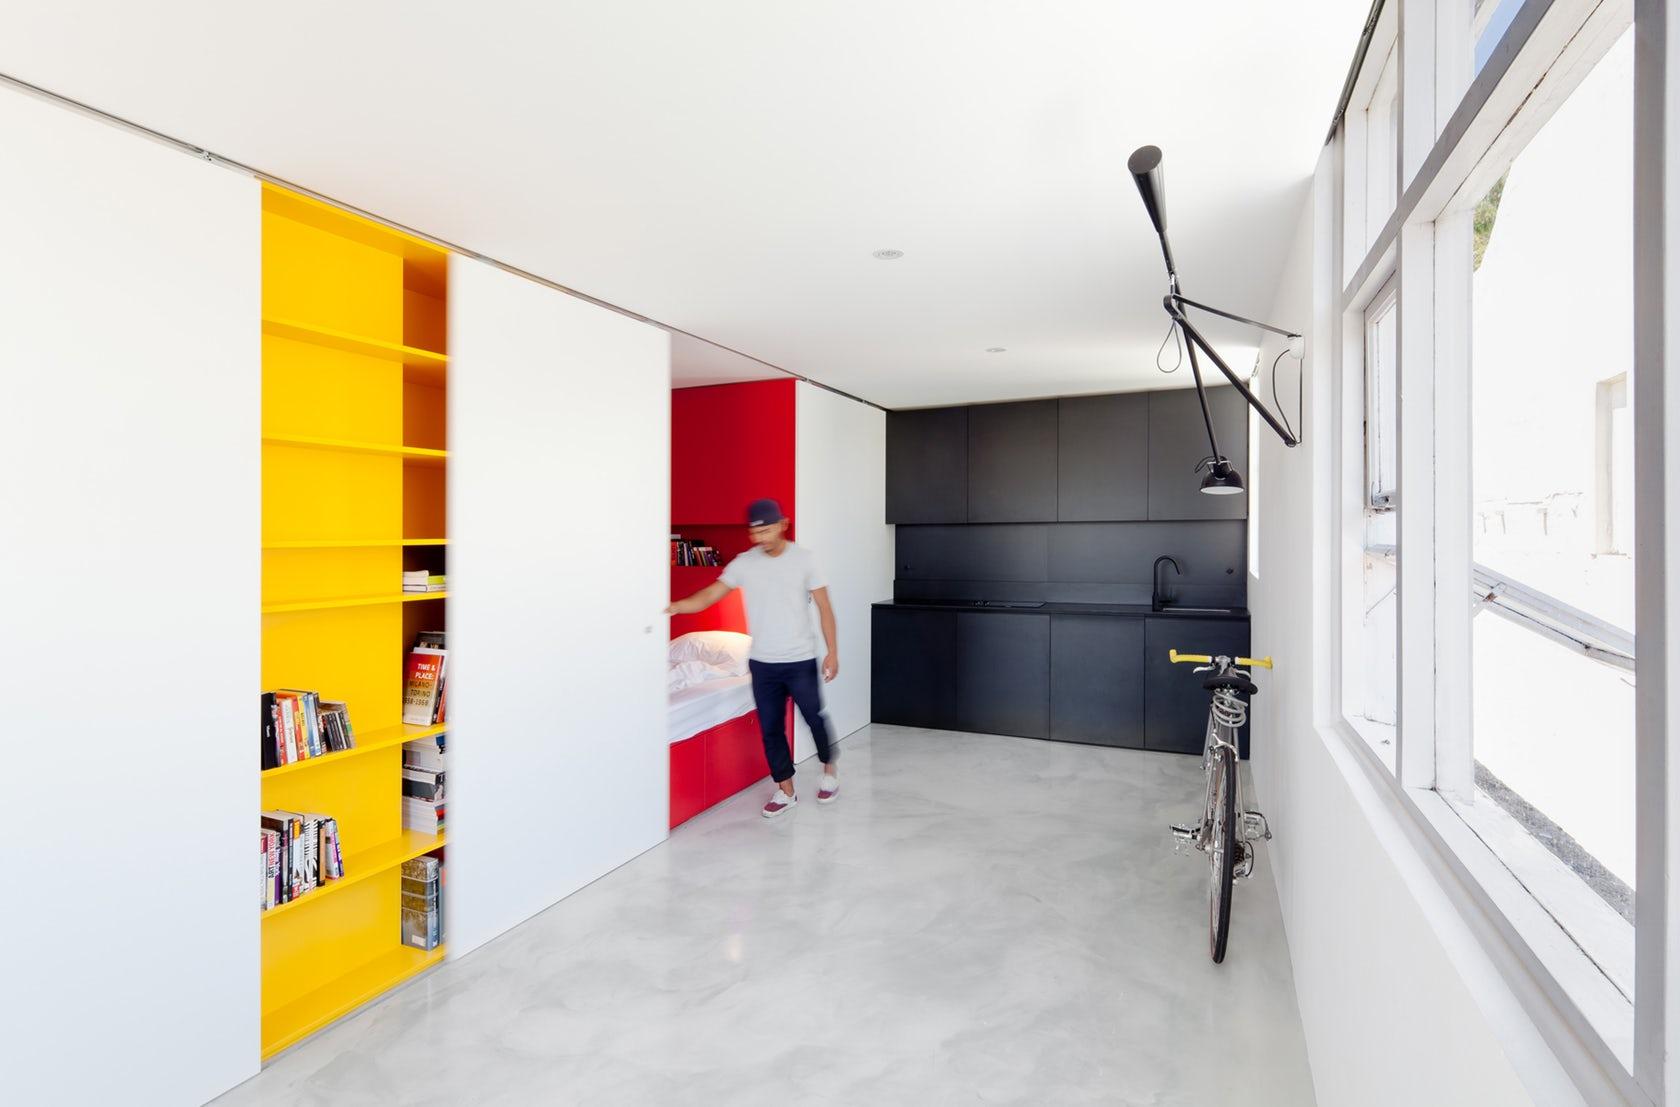 Perencanaan Cerdas Apartemen Sempit: 10 Gambar Arsitektur Mencerahkan